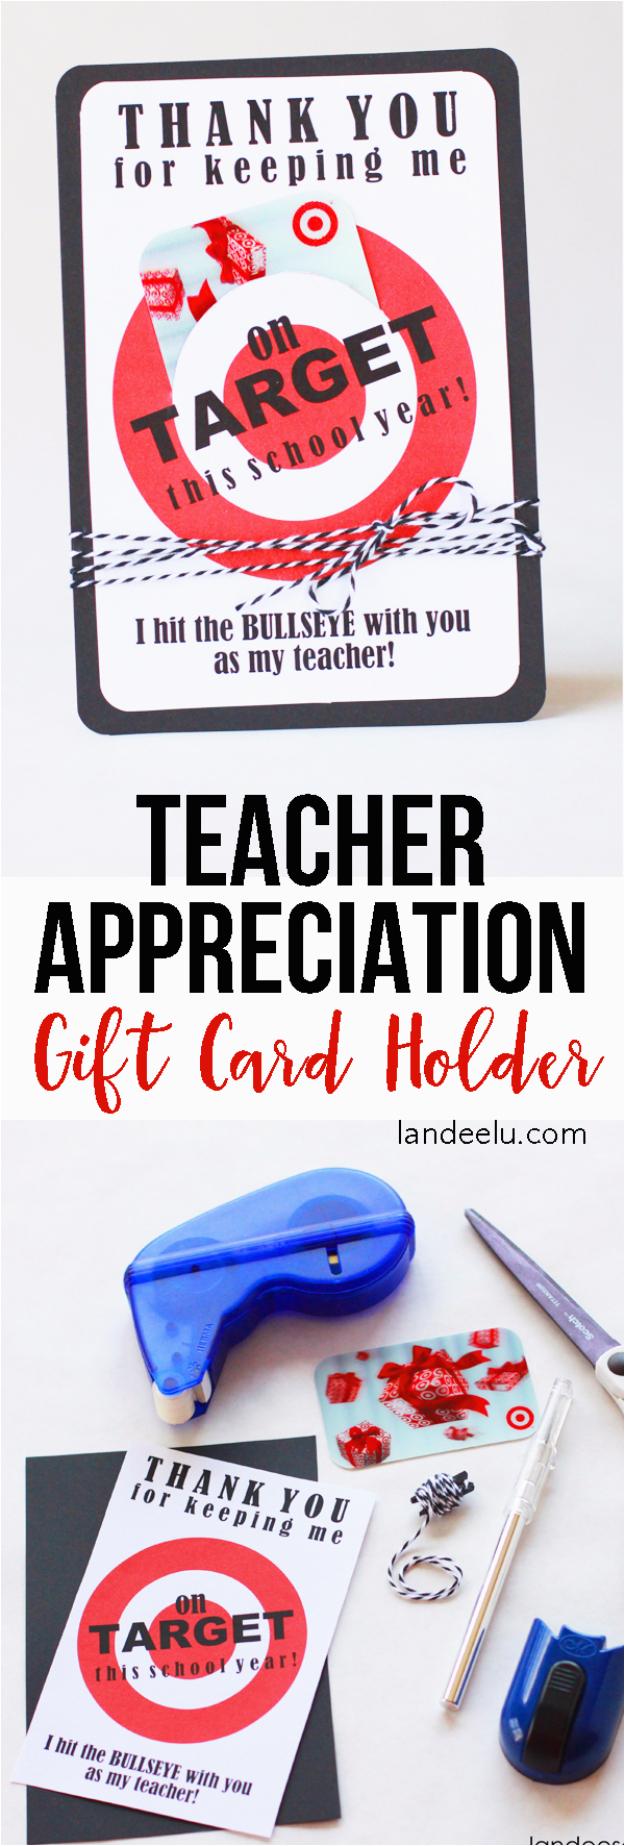 bdbcce8bdebe diy teacher gifts 33 best ...